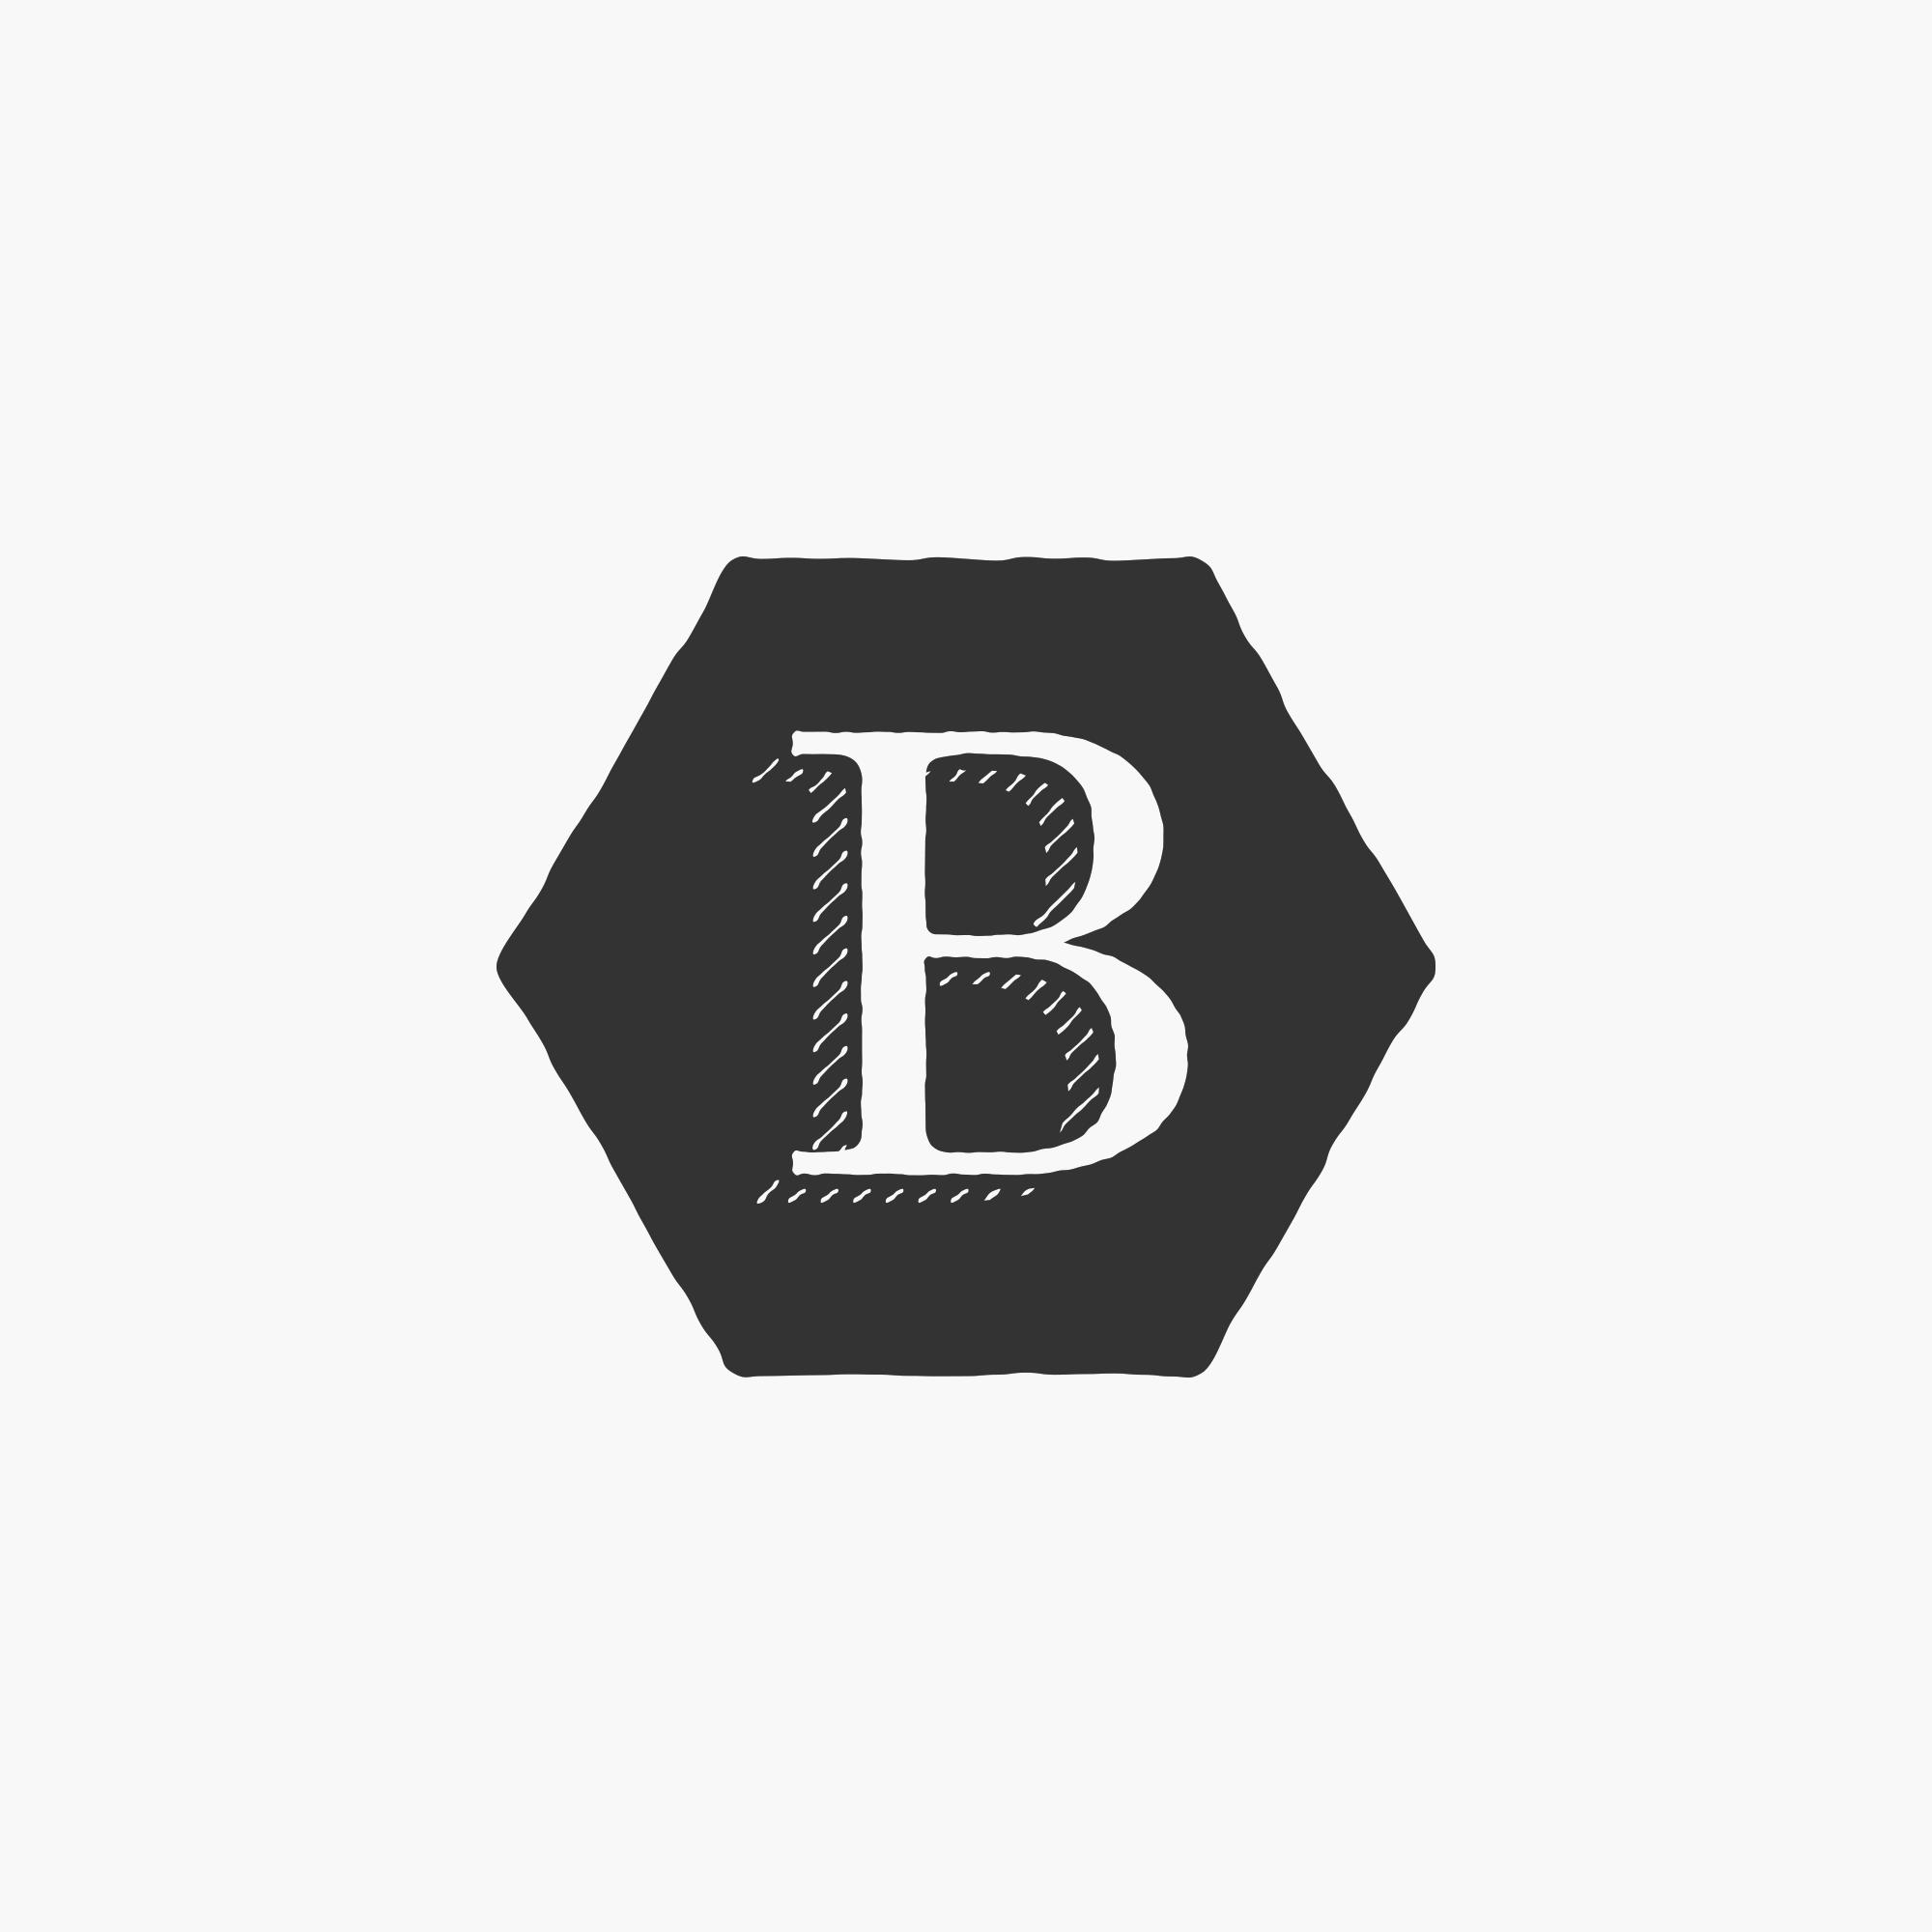 Logos_BalladMark@2x.png